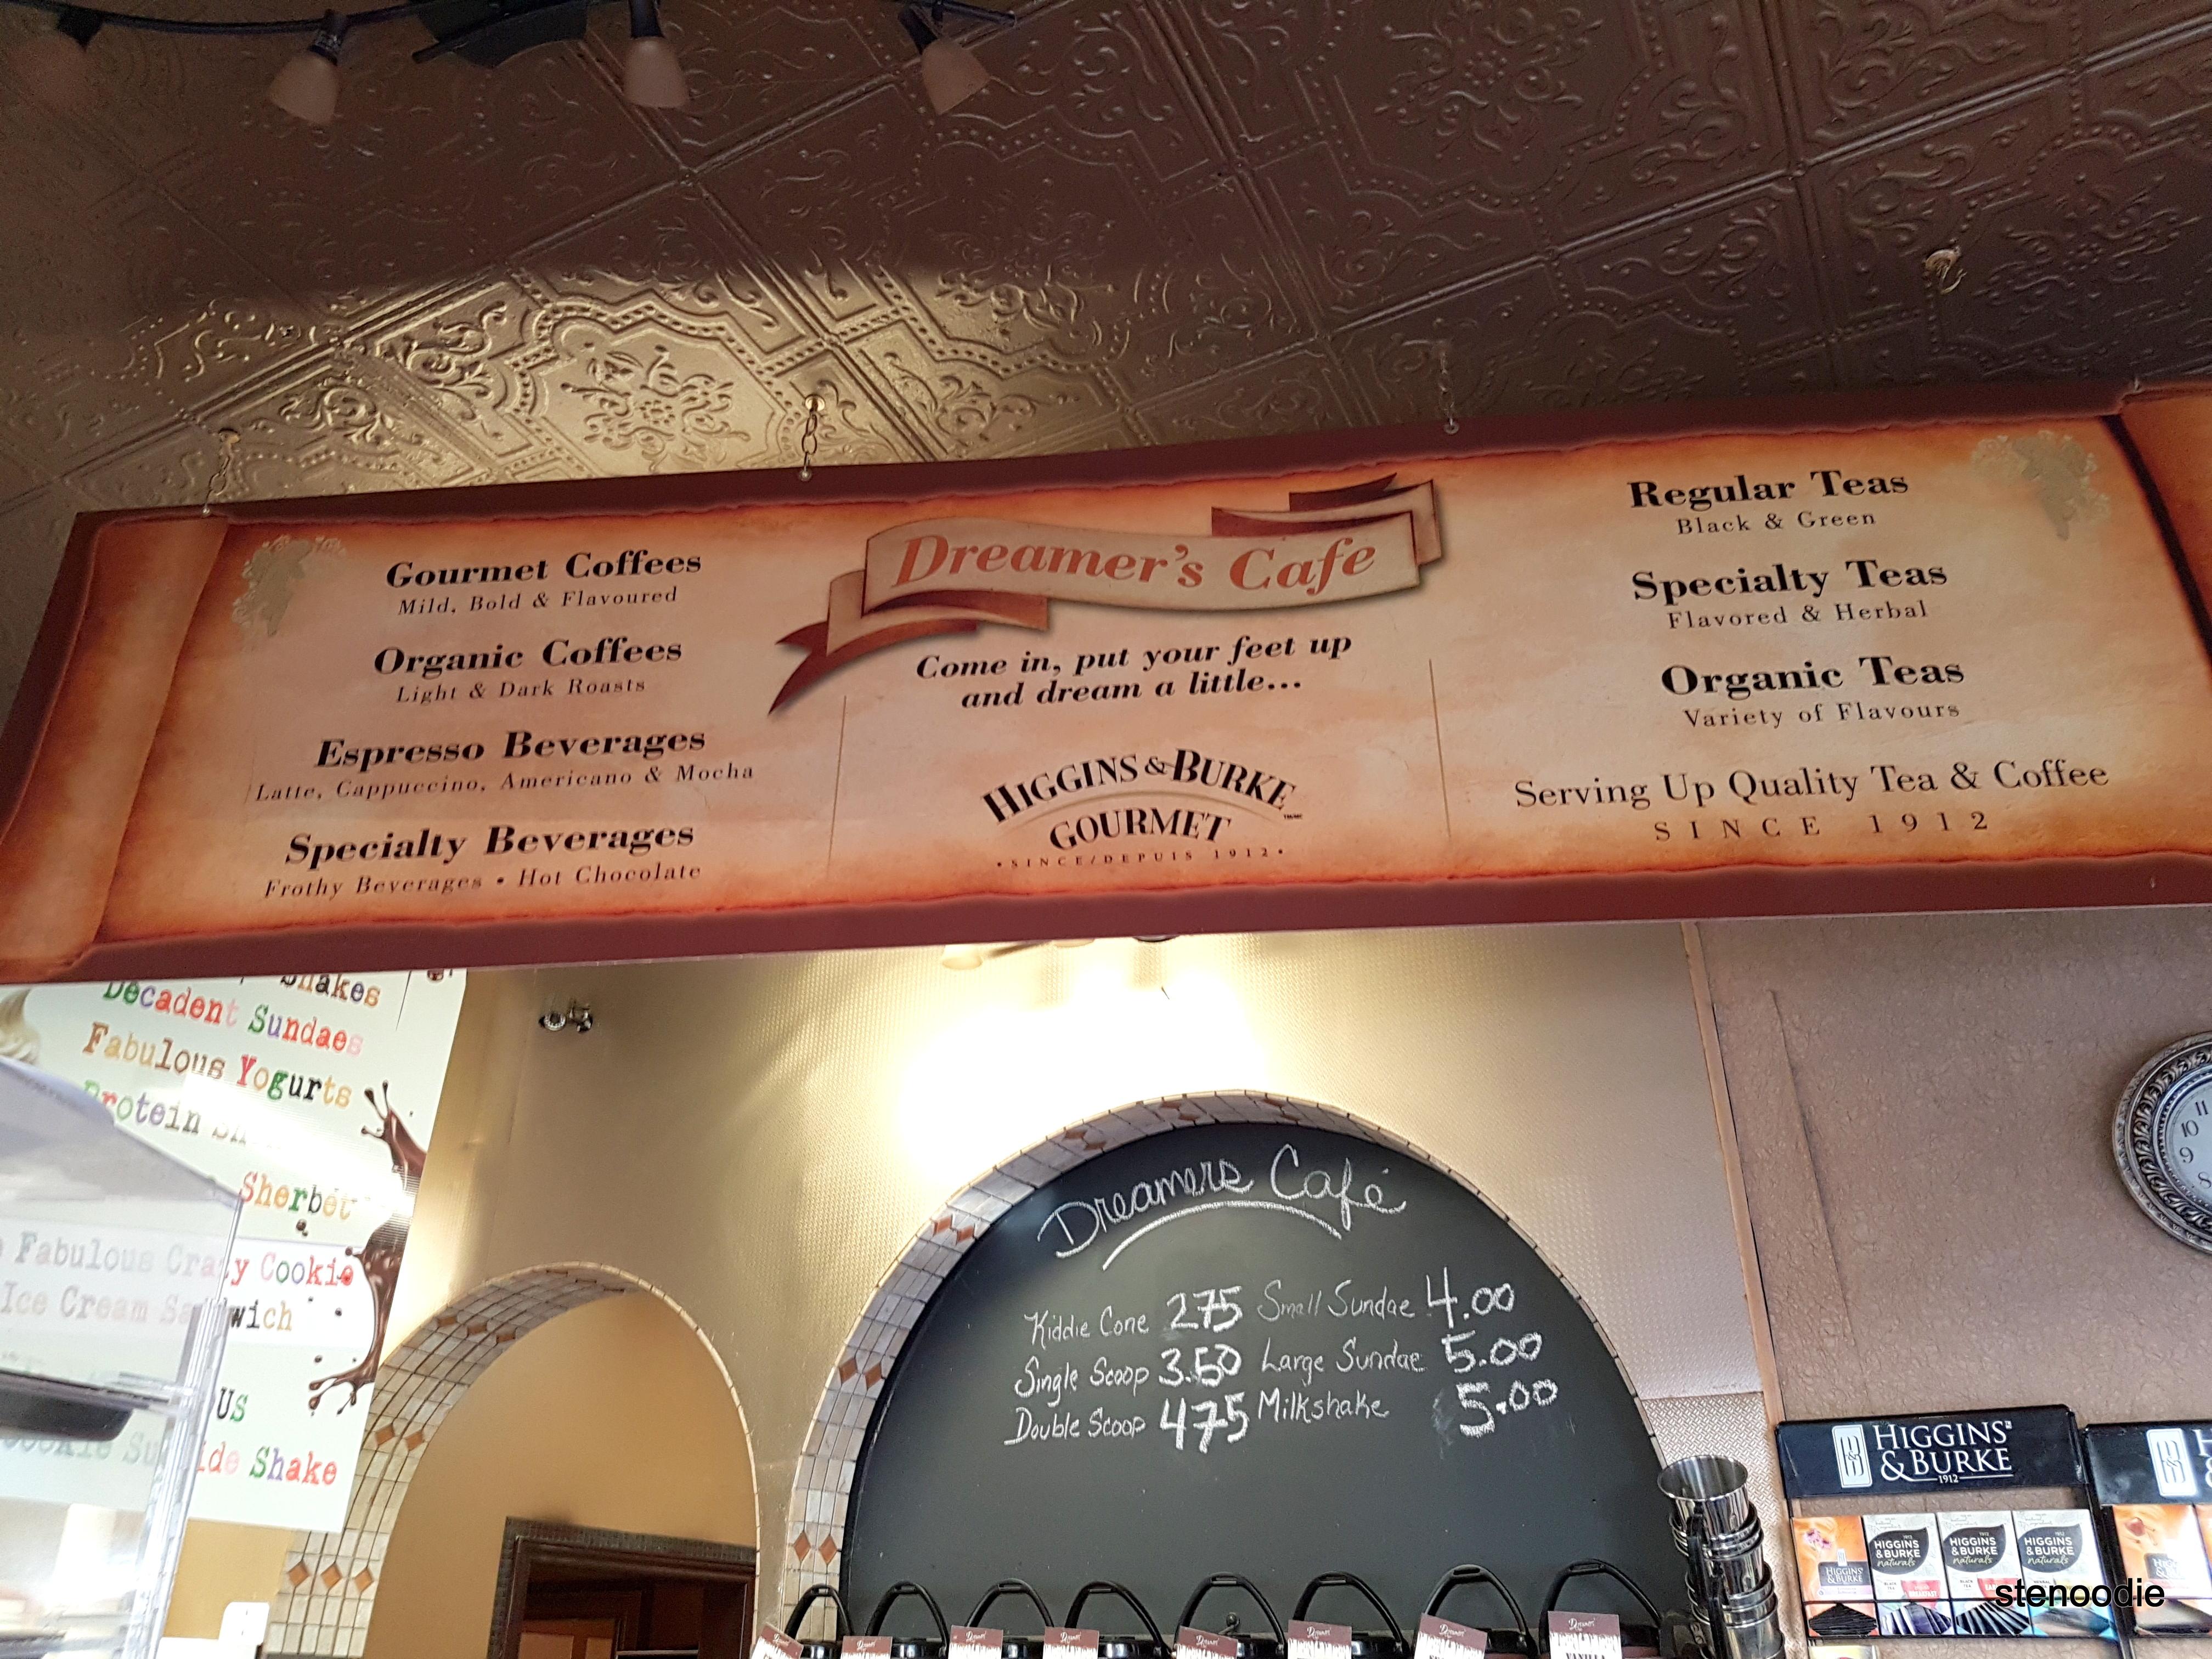 Dreamers' Cafe coffee and tea menu